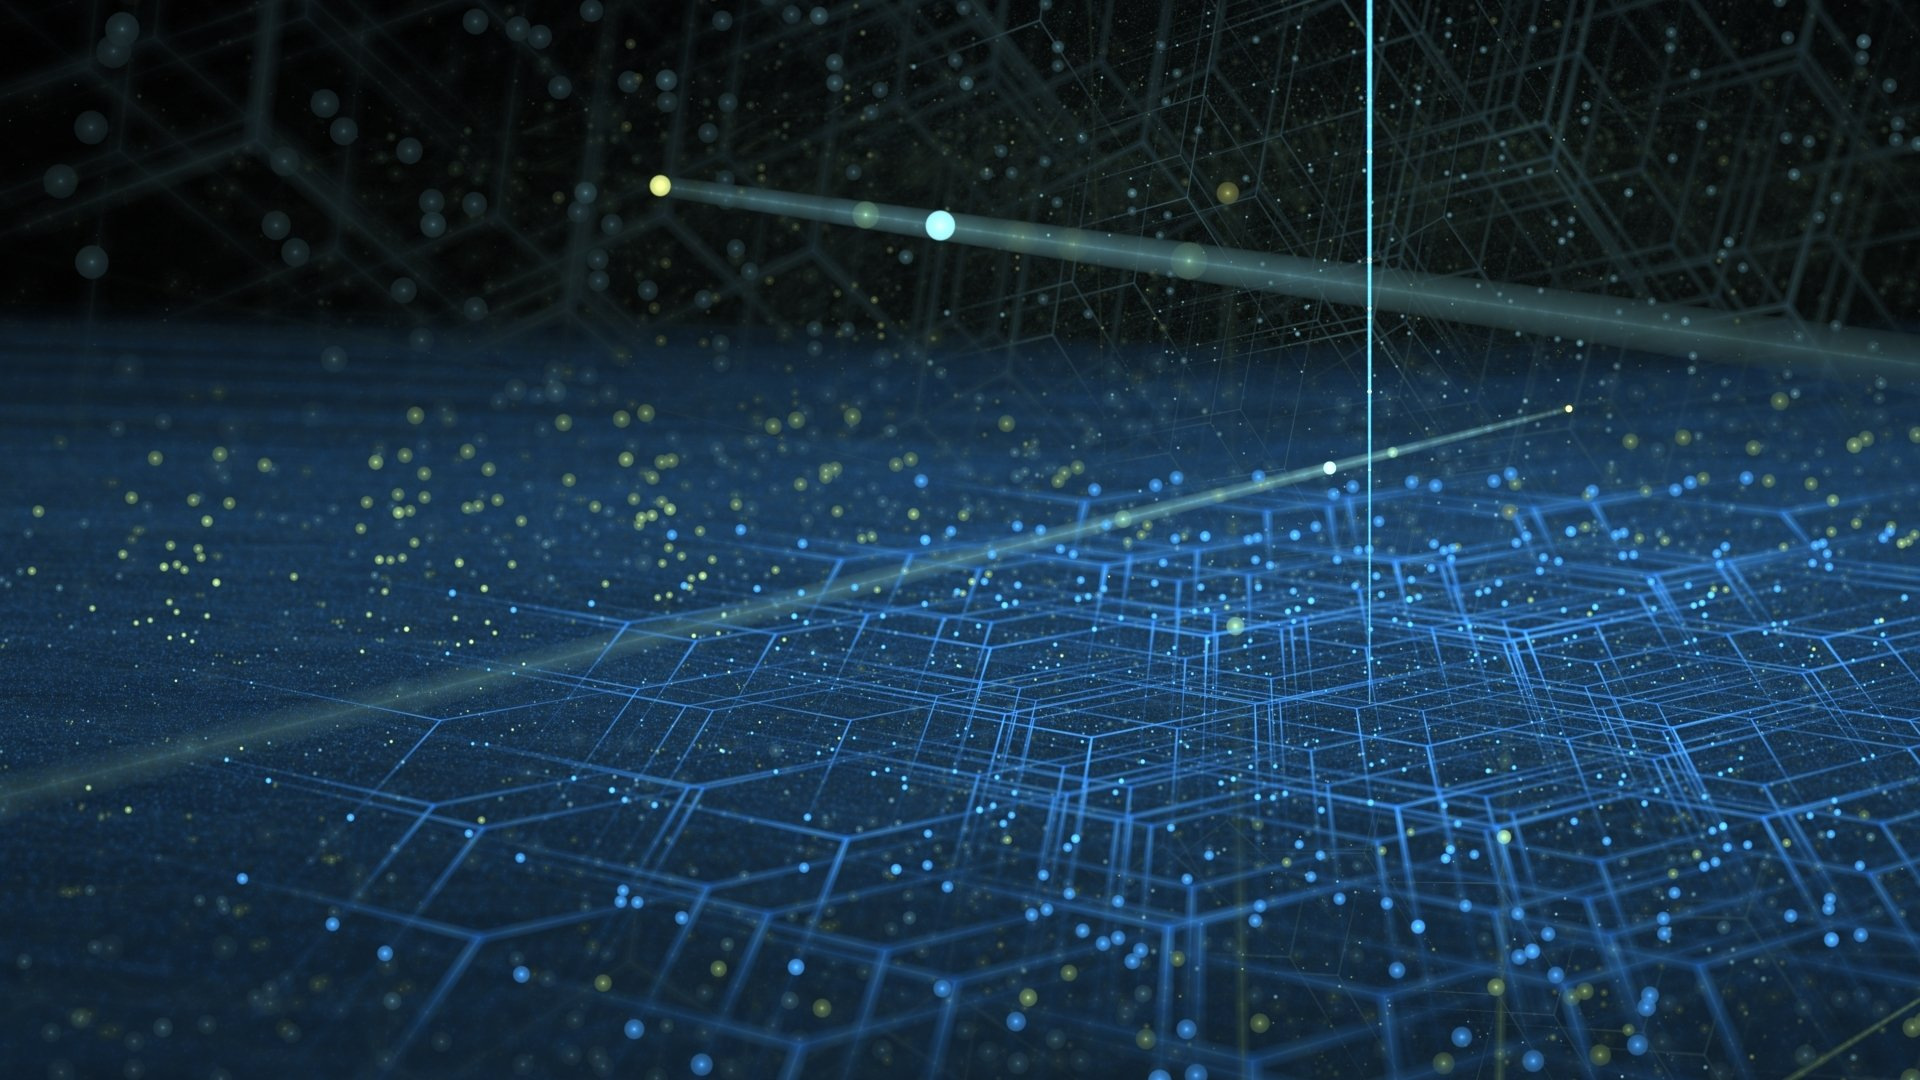 Abstract - Geometry  Apophysis (software) Hexagon Glow Blue Wallpaper